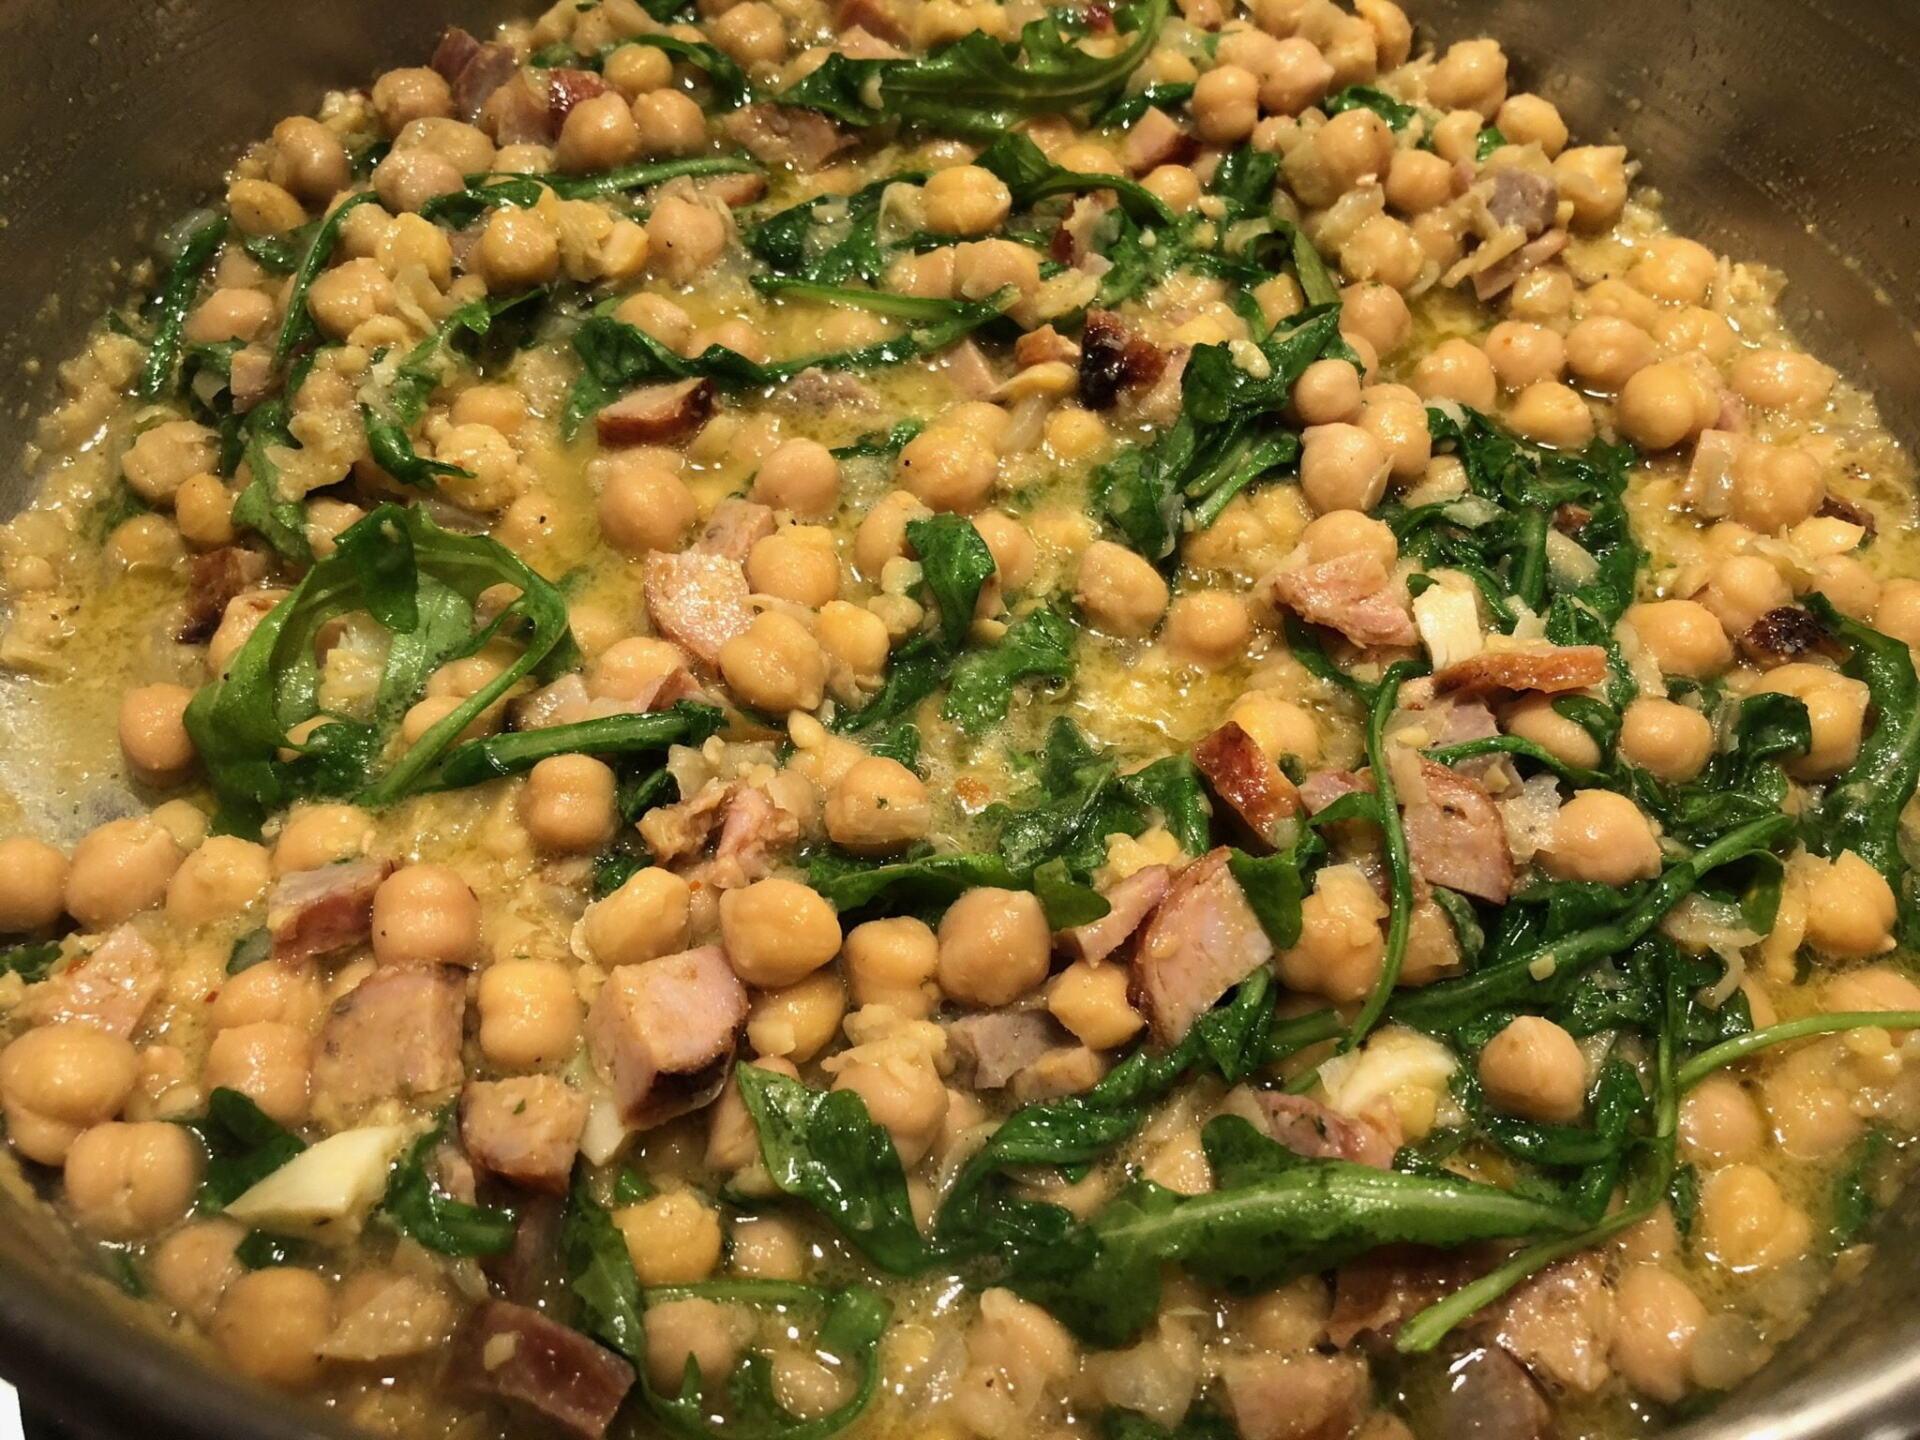 Chick peas, sausage and arugula cooking away